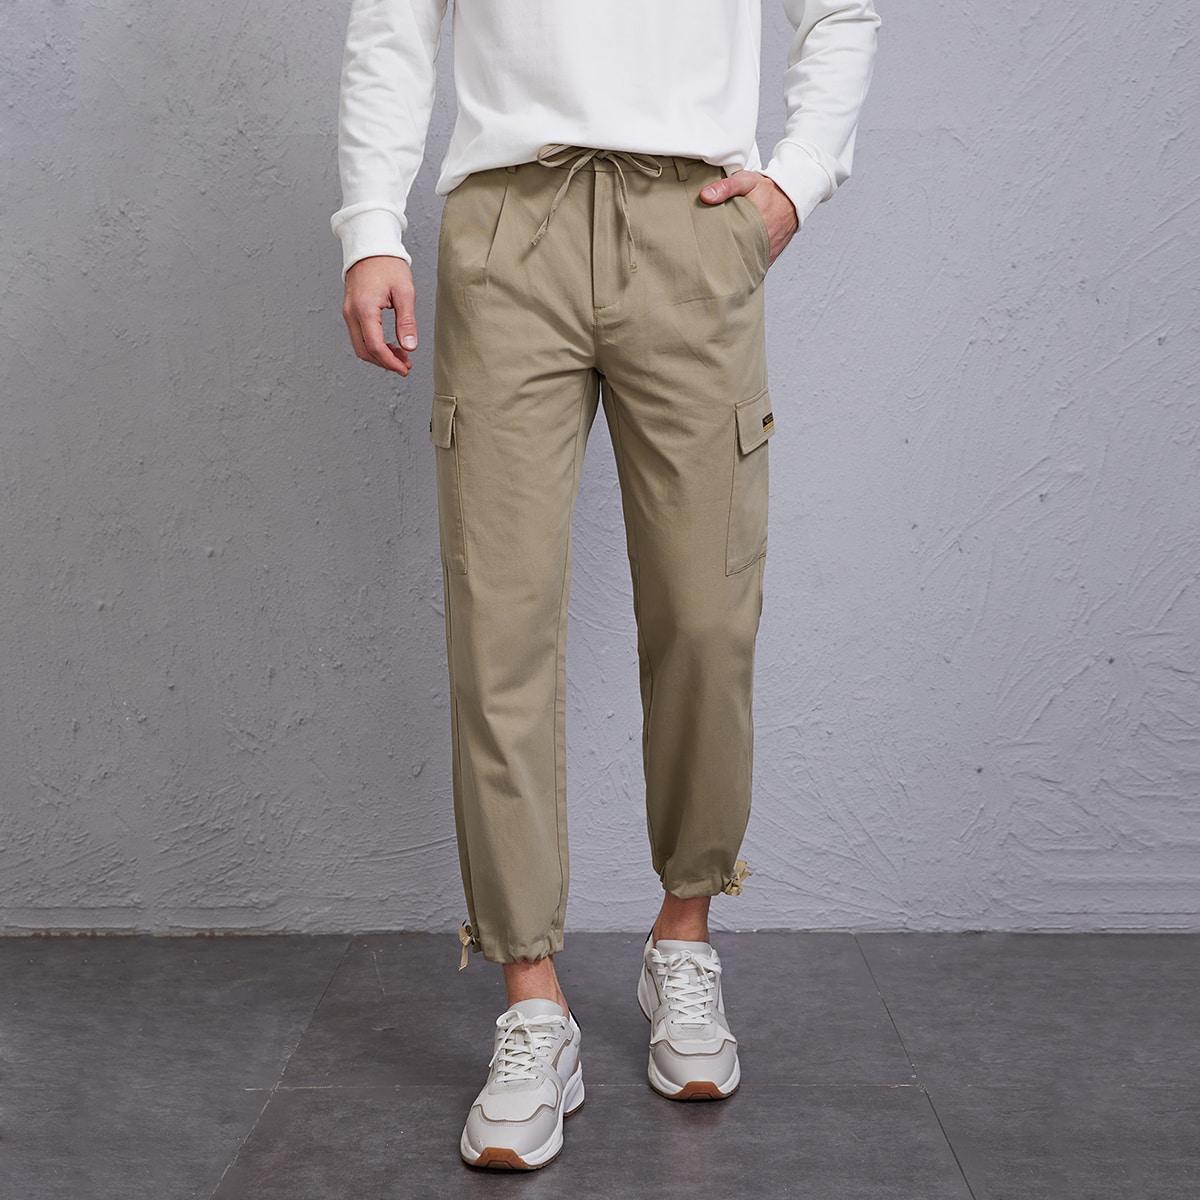 Пугавица буква улица мужские брюки